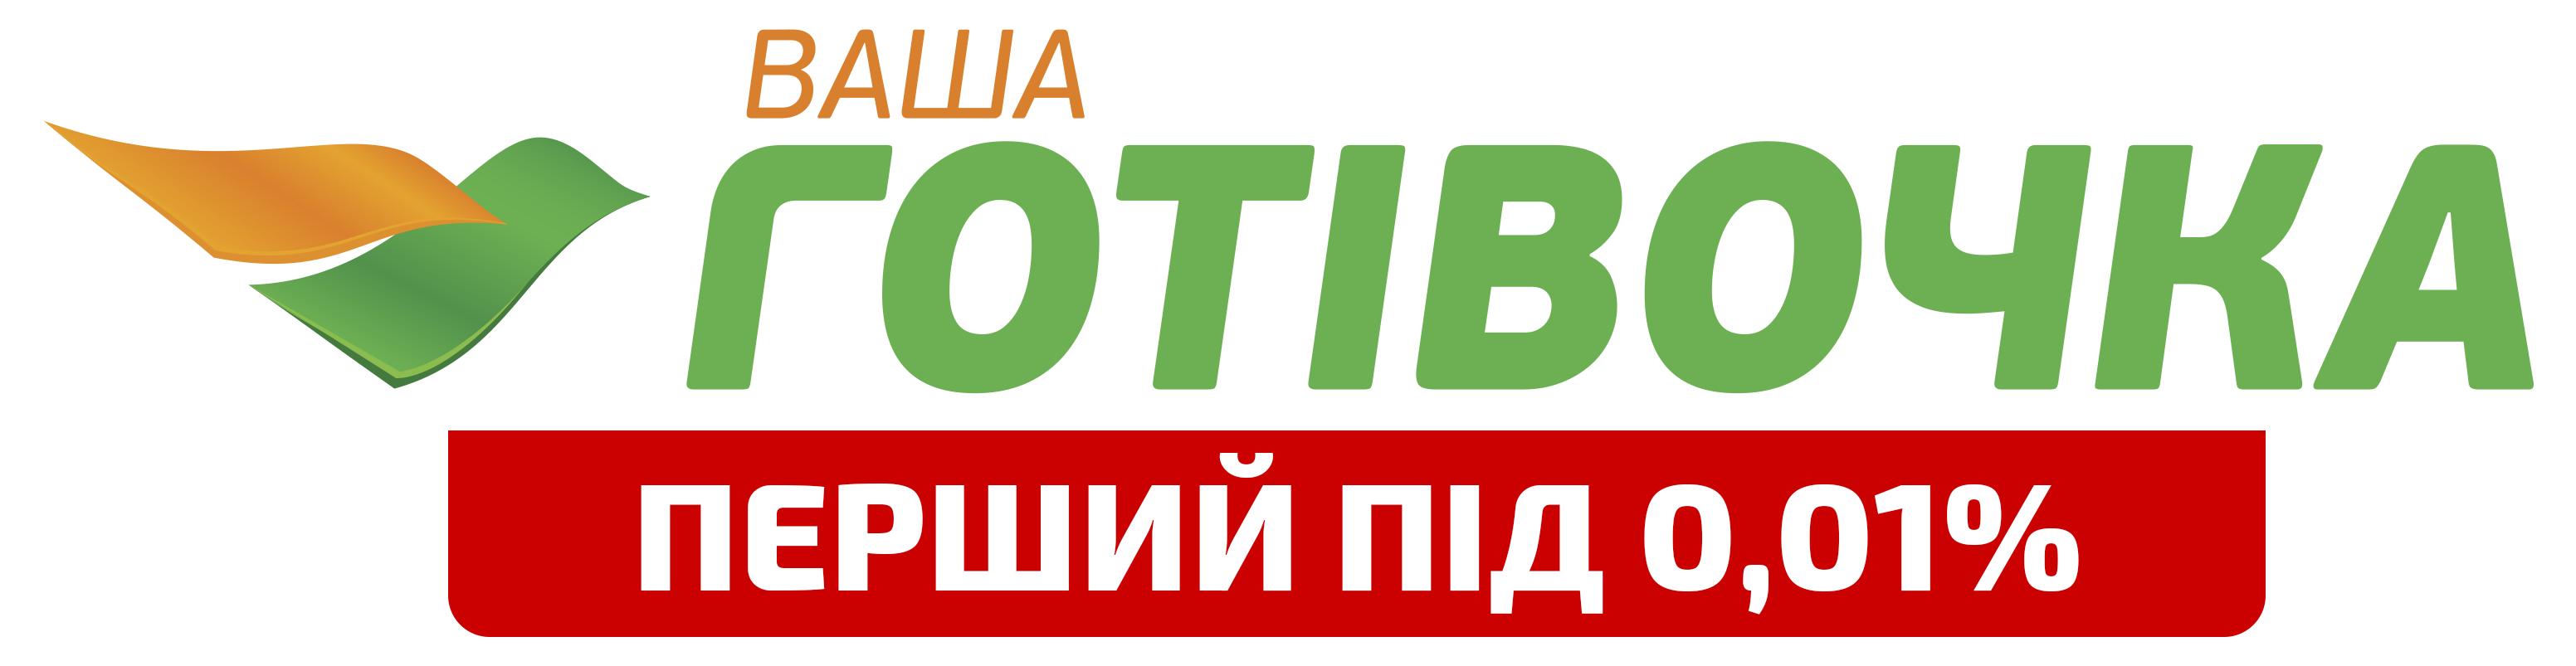 vashagotivochka.ua logo